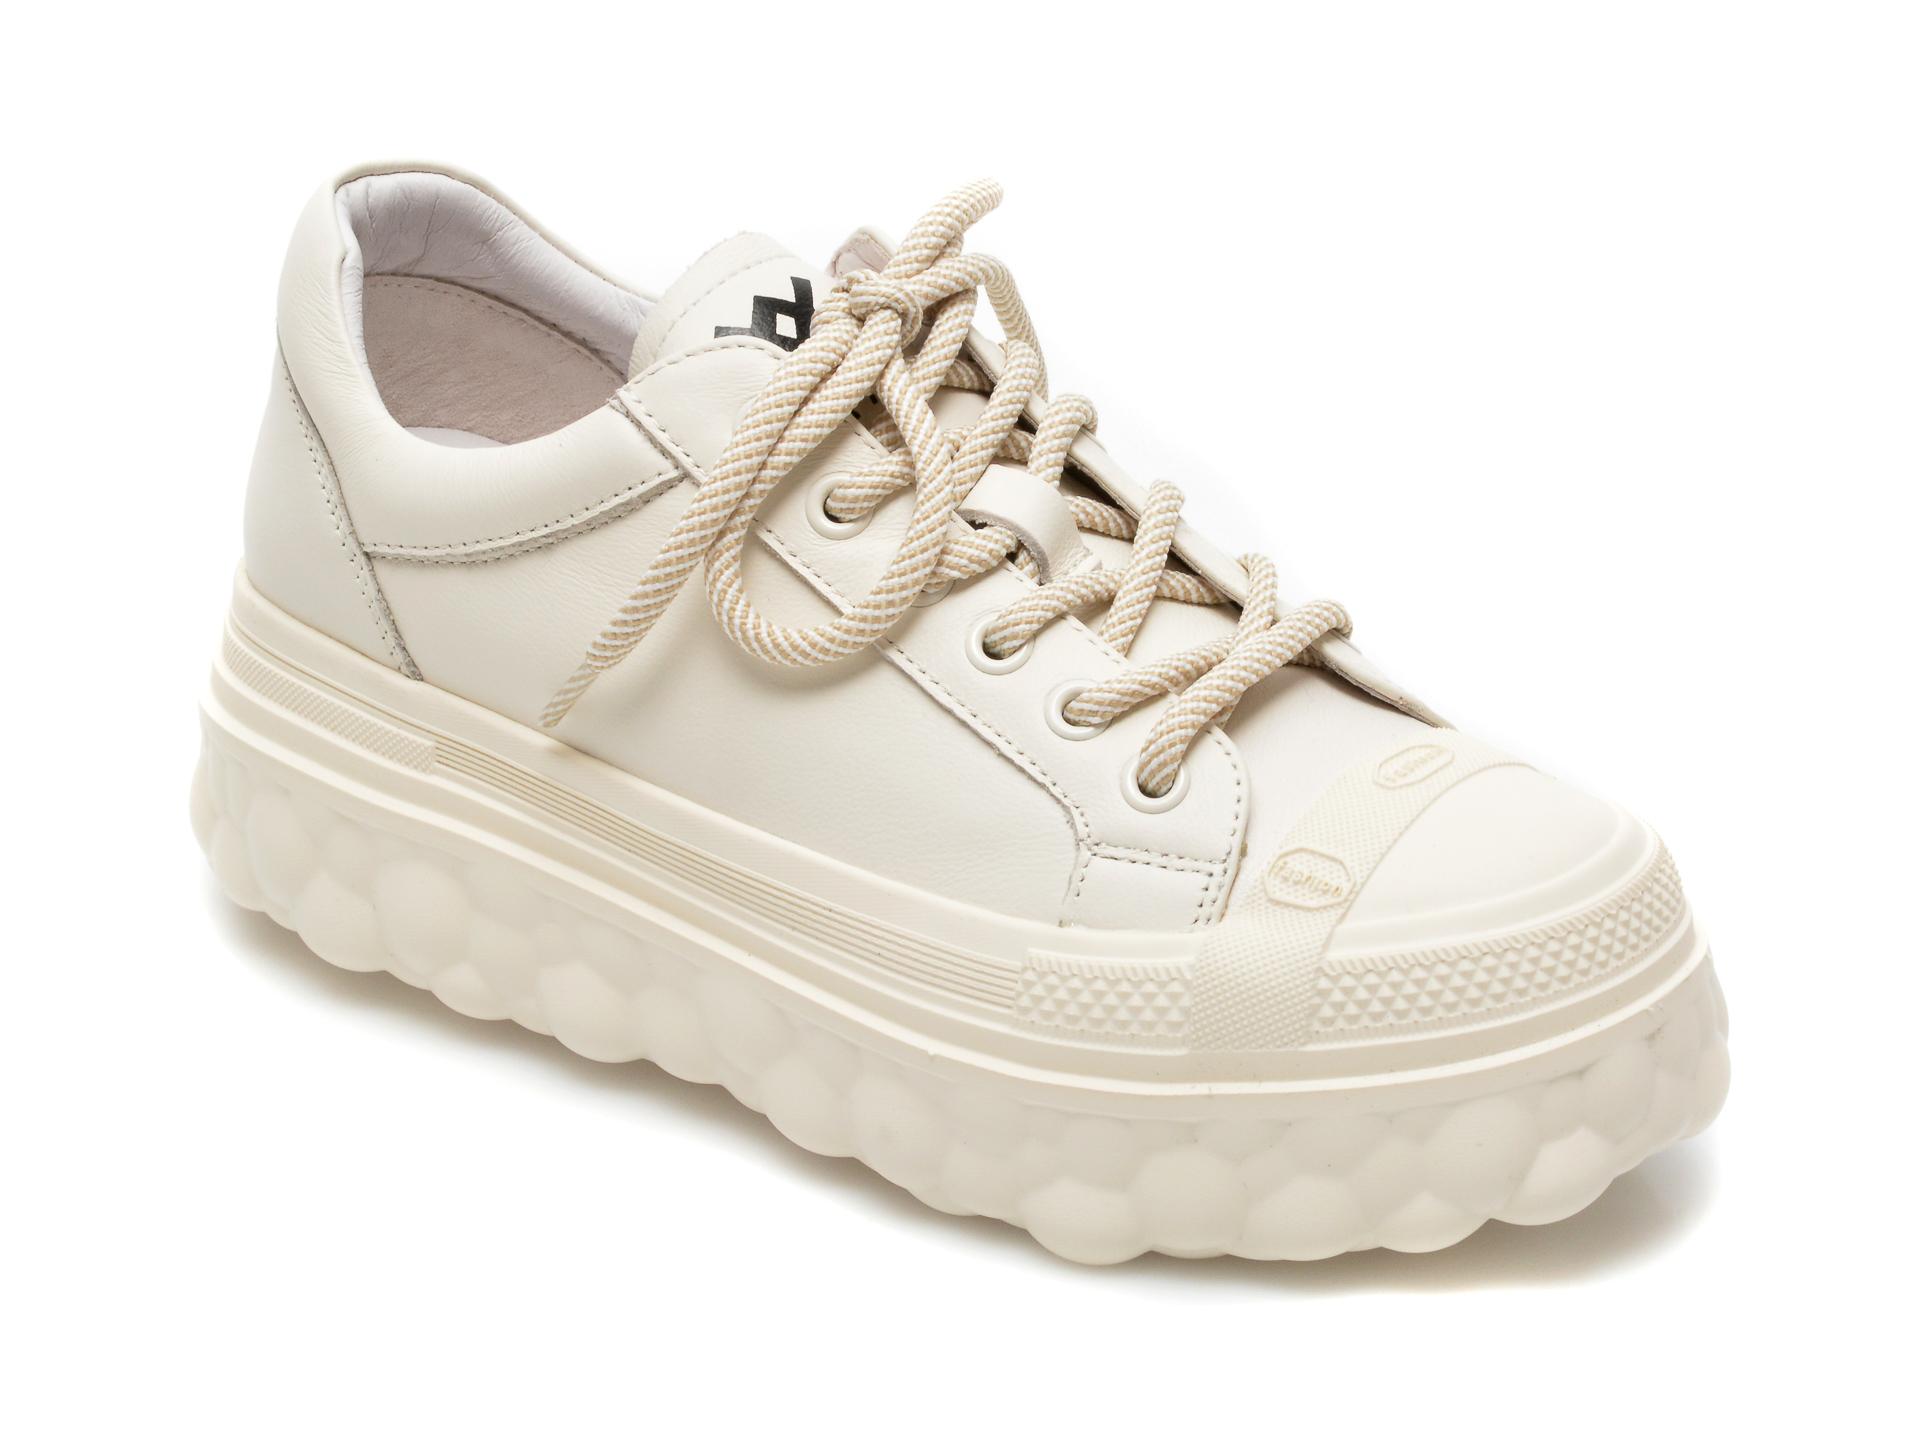 Pantofi sport GRYXX albi, A2152, din piele naturala imagine otter.ro 2021